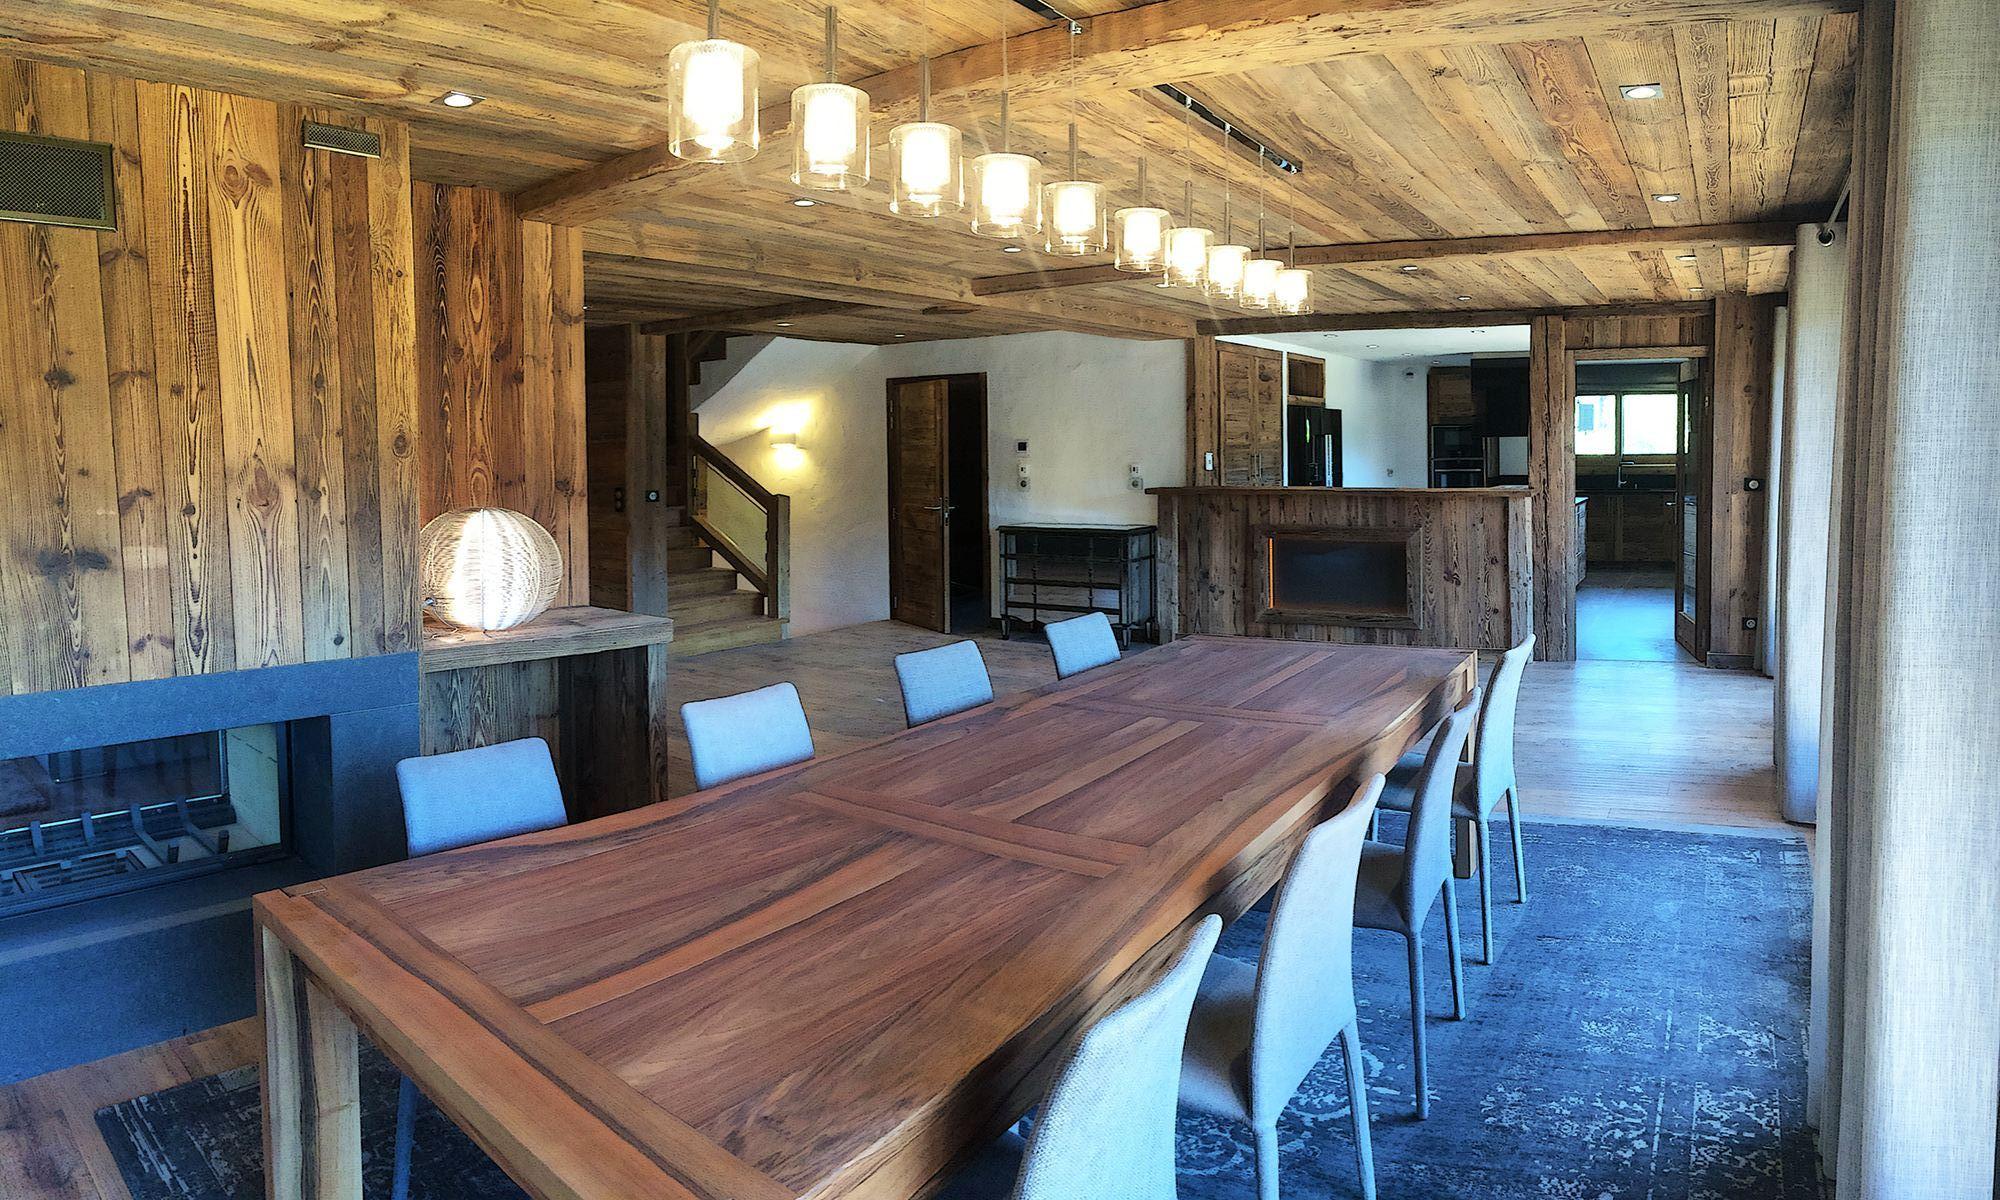 Property For Sale at Megève Village center Chalet Heliodore